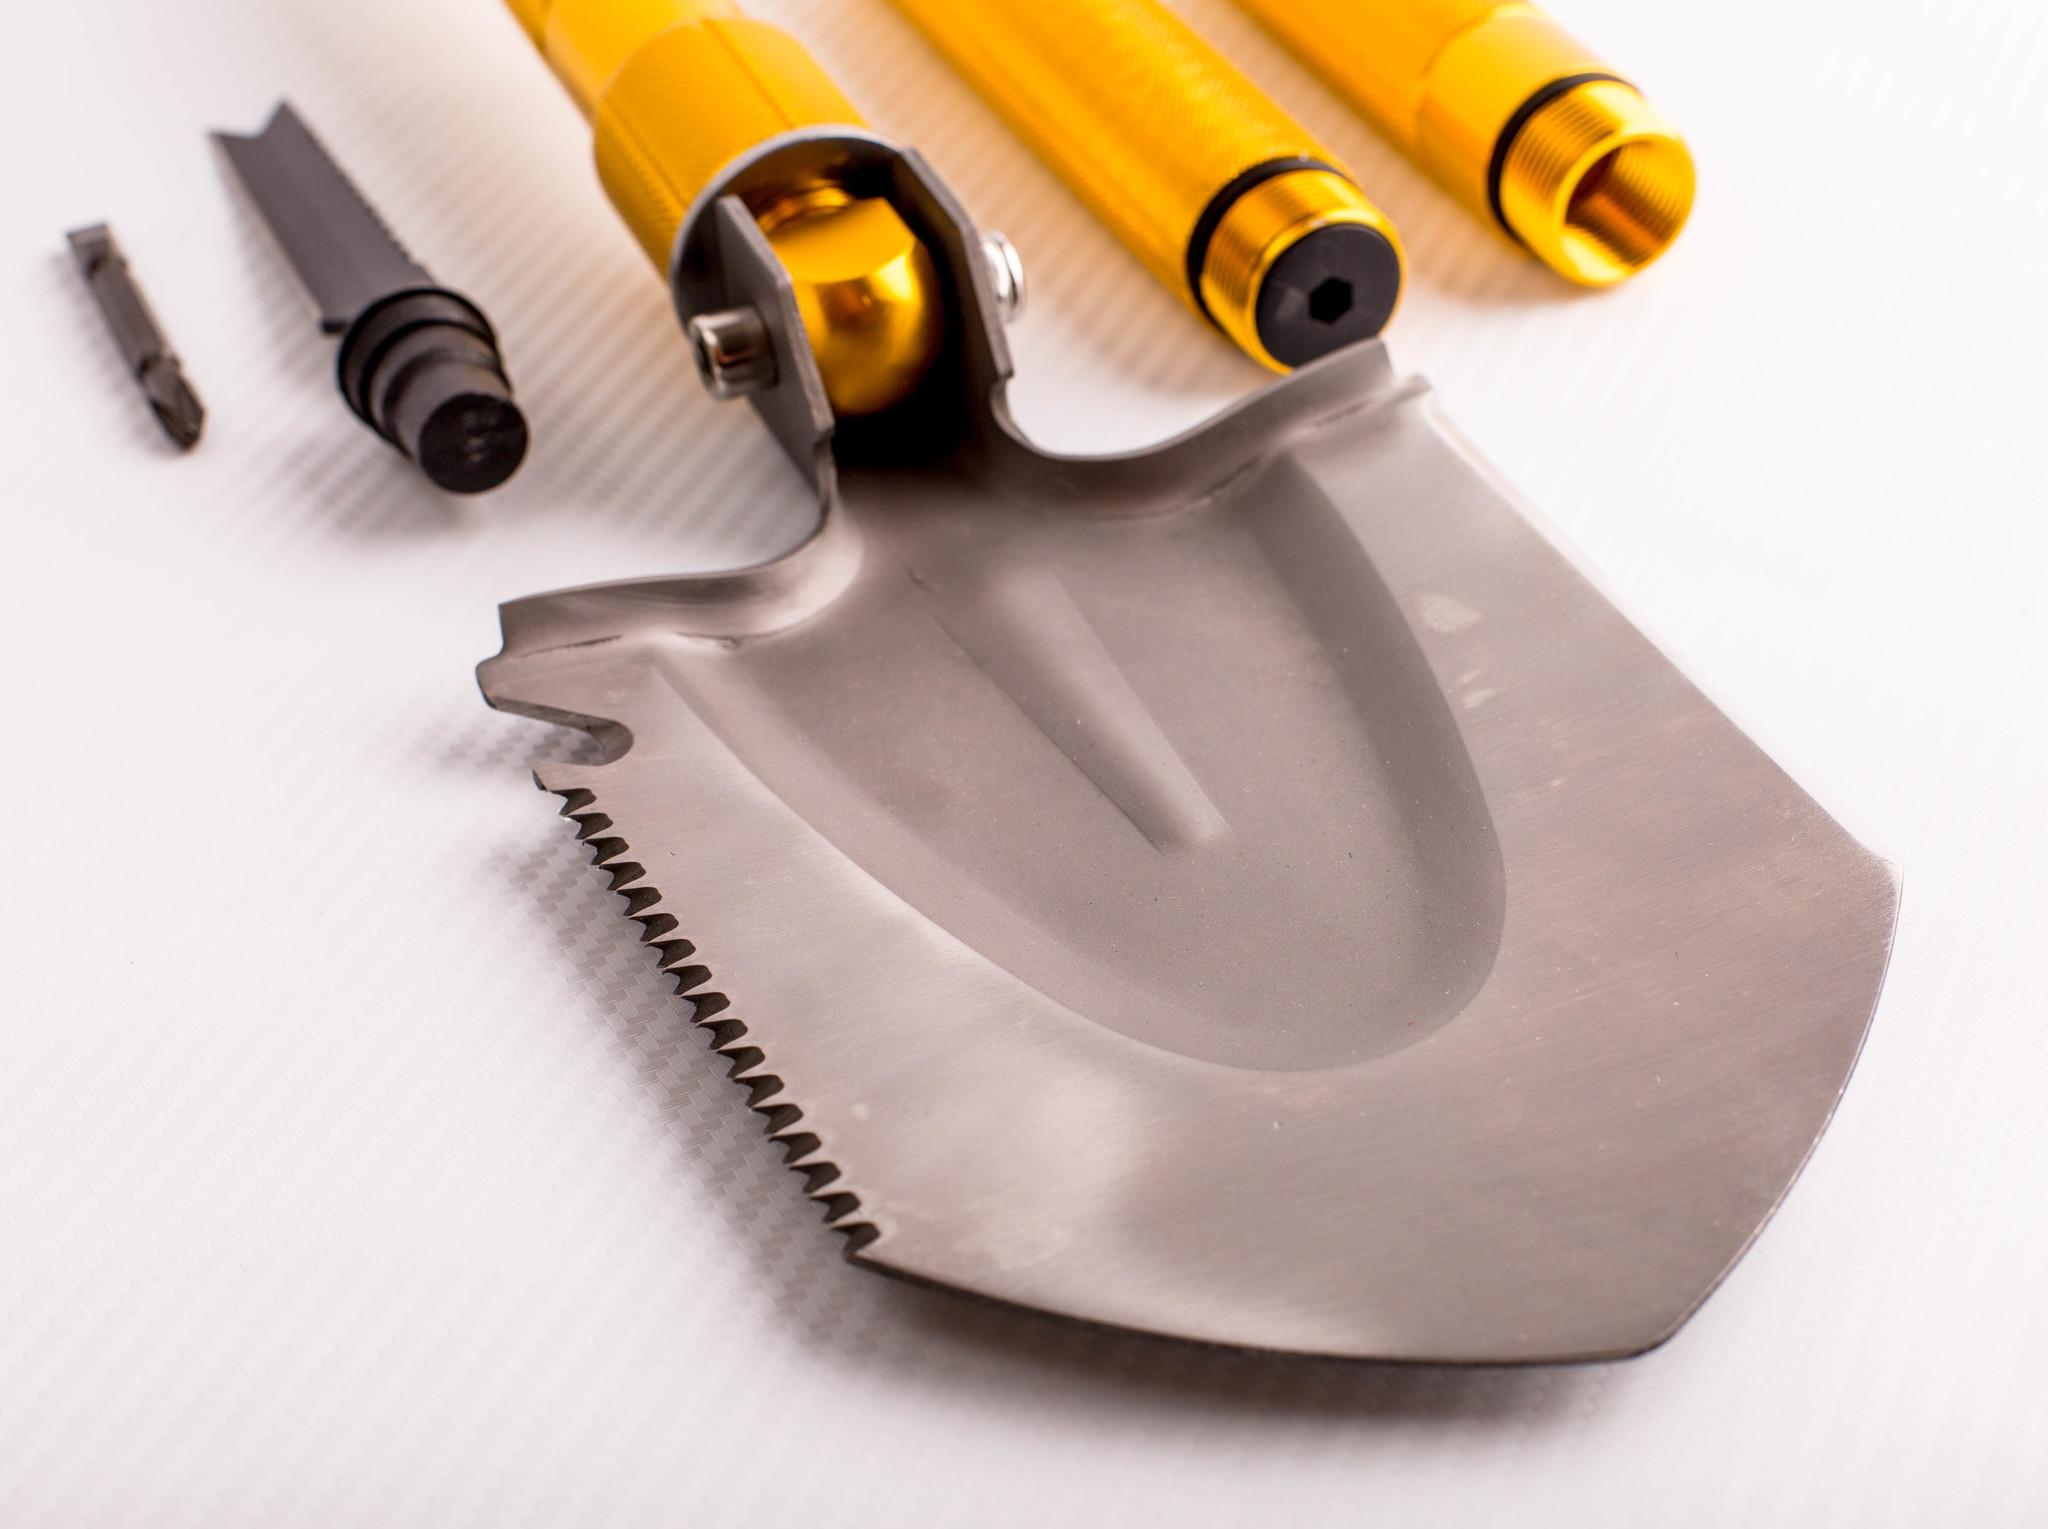 Фото 20 - Многофункциональная лопата, золотистая рукоятка от Noname